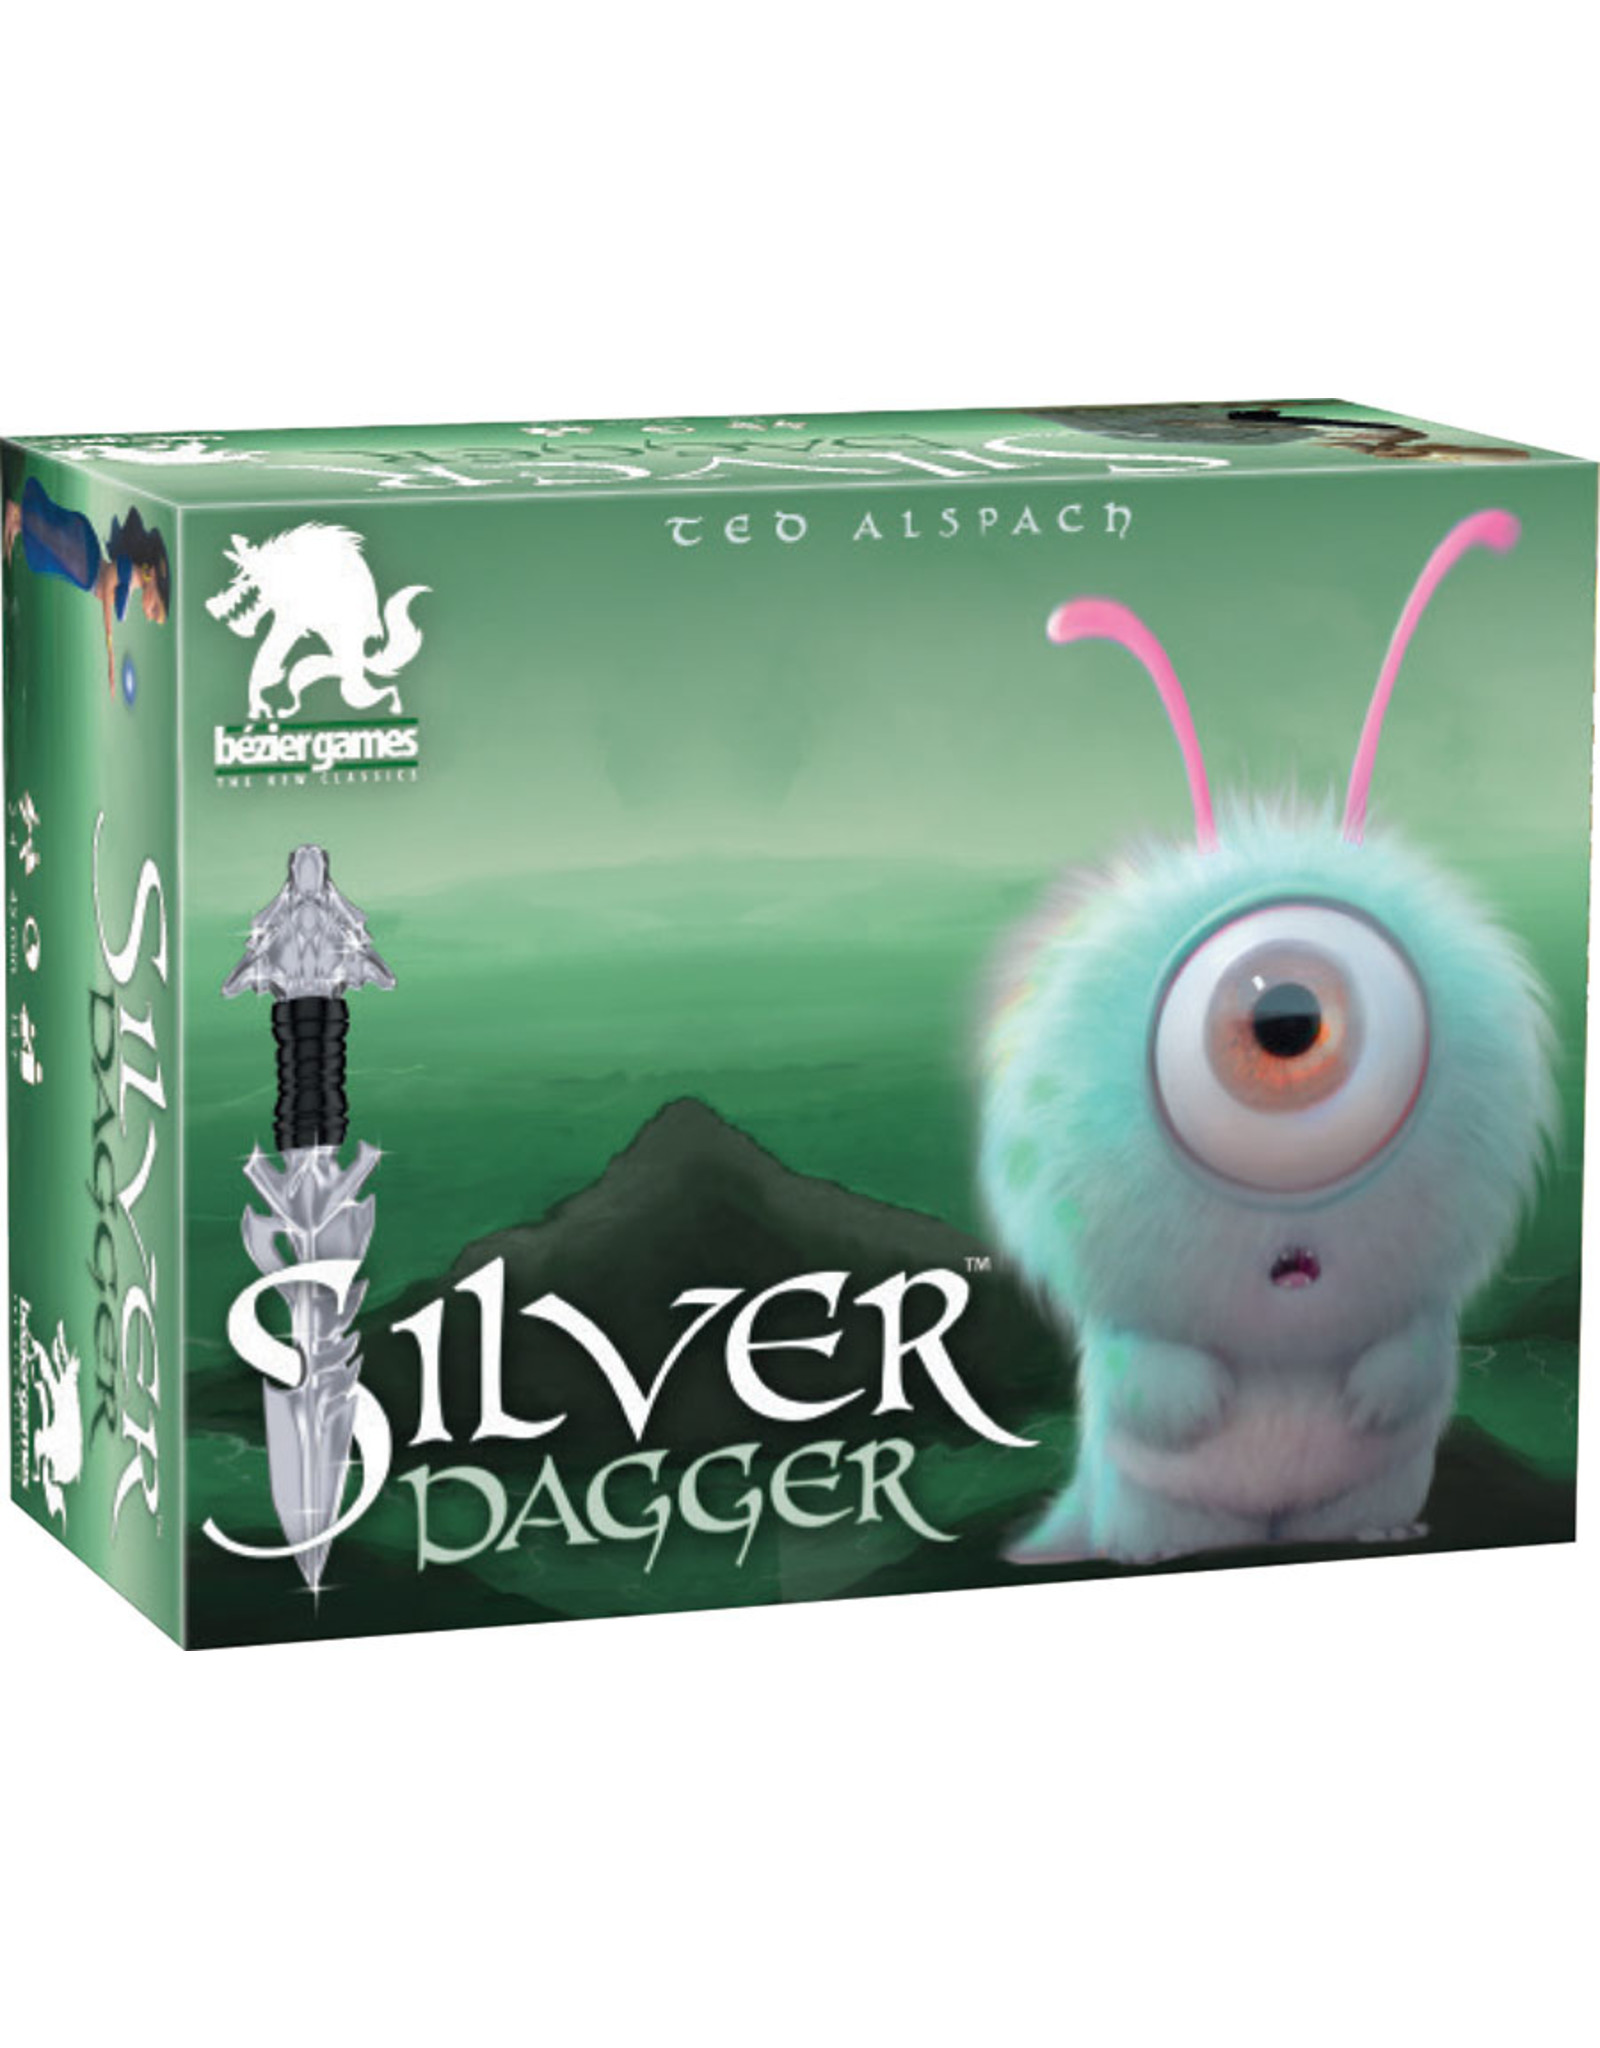 Bezier Games Silver Dagger